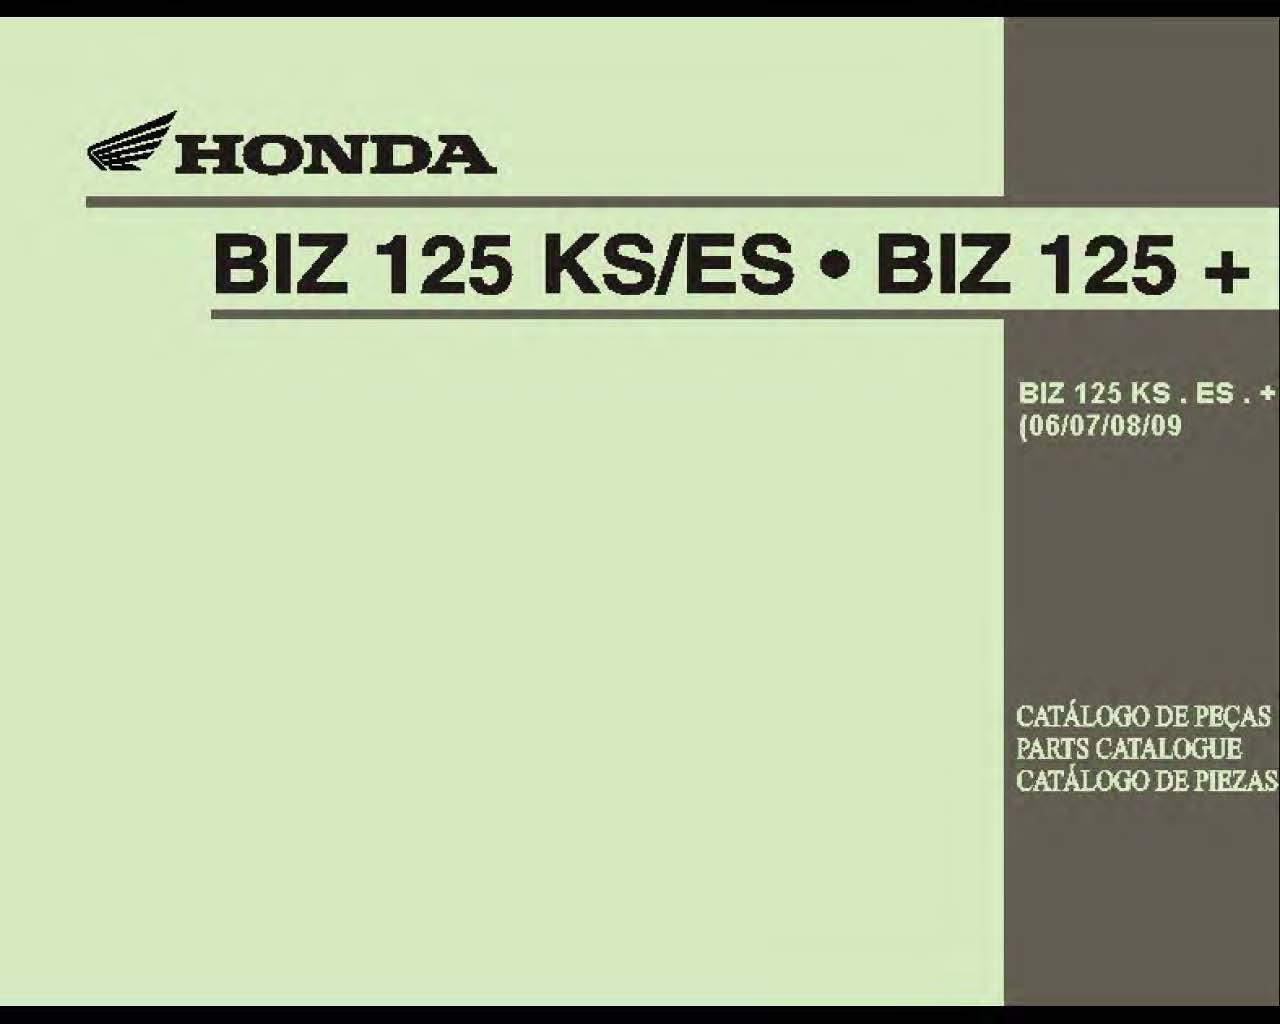 Parts list for Honda BIZ125KS (2006-2009) (Multilingual)